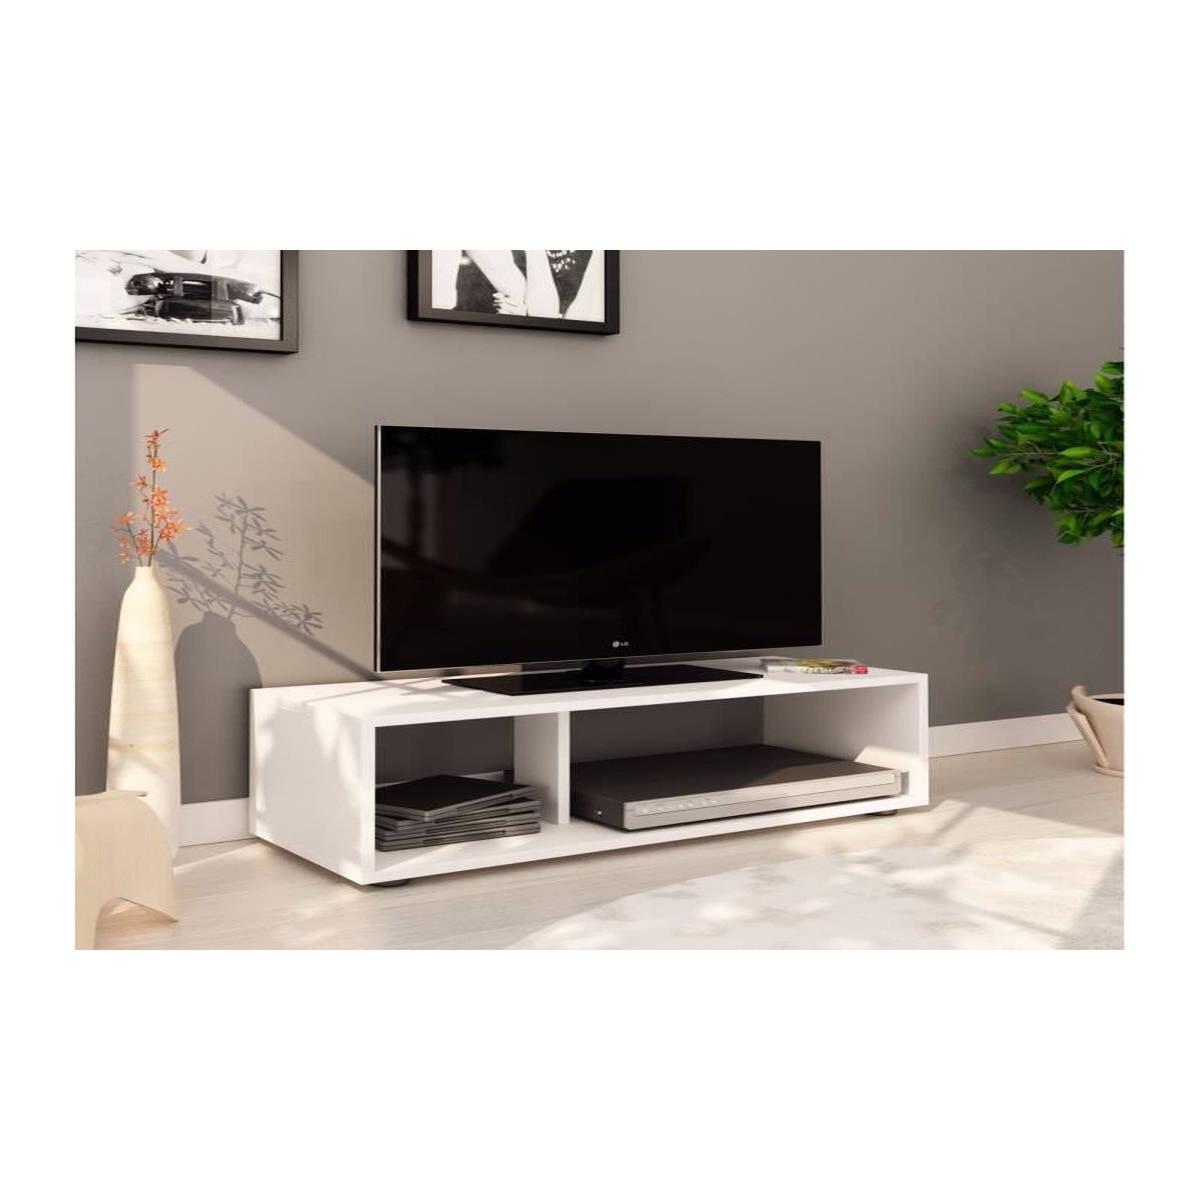 Meuble TV Contemporain Boom - 80x30x25 cm